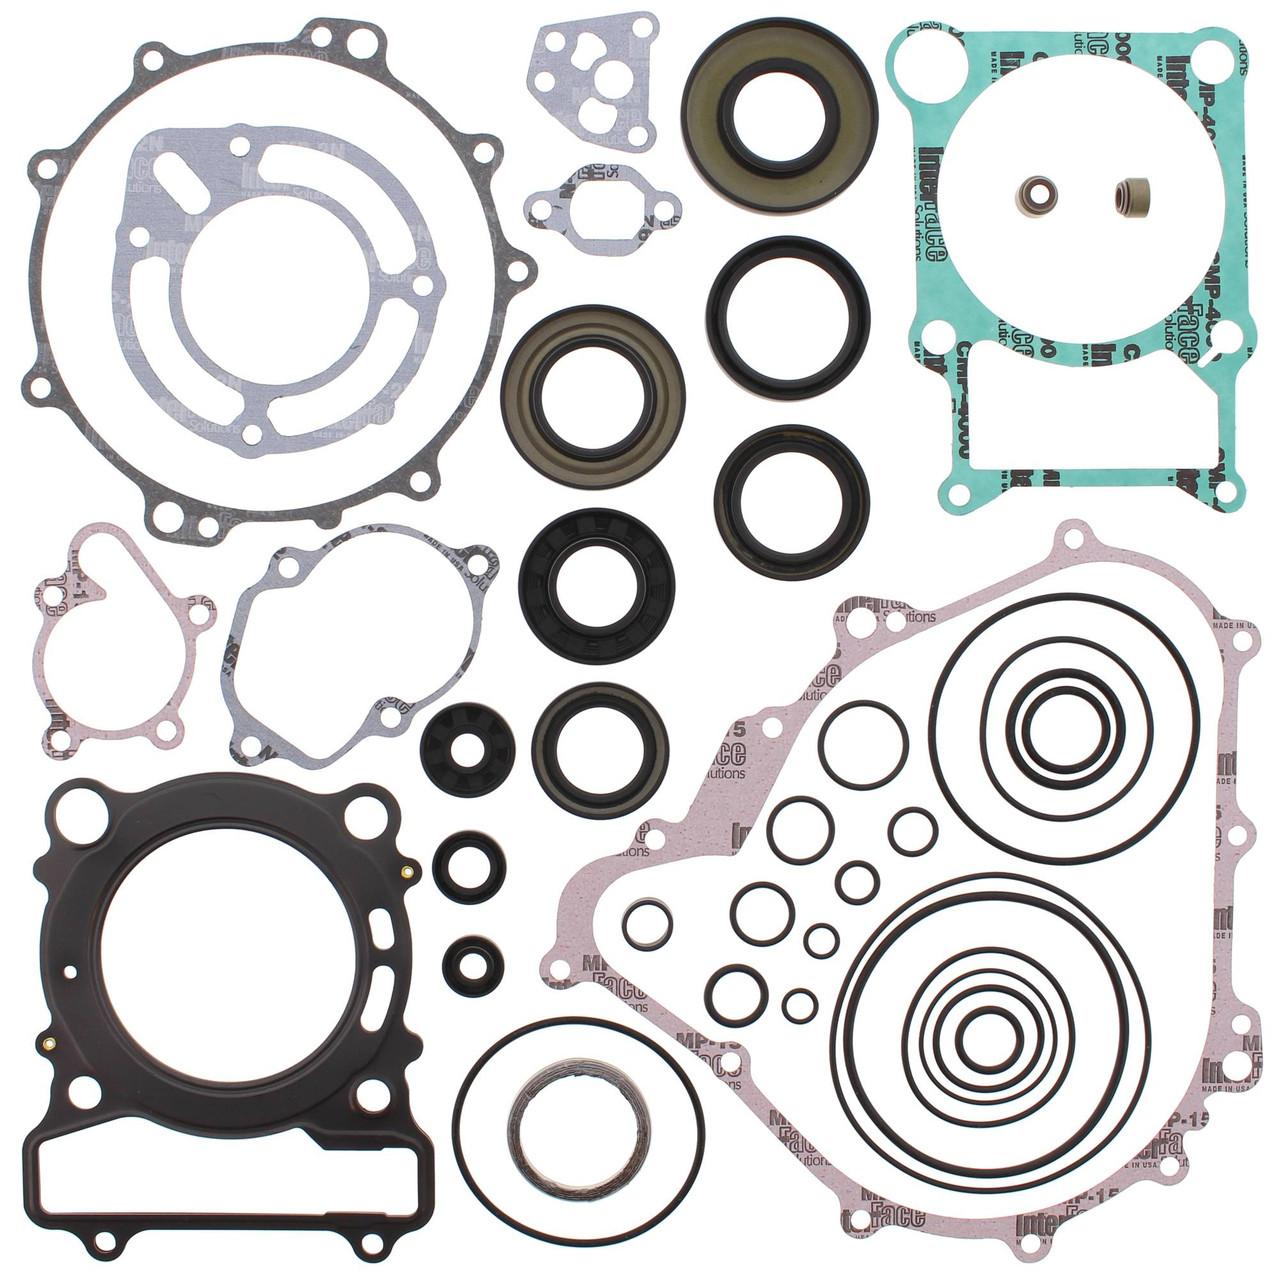 Winderosa Engine Oil Seal Kit For Yamaha 450 RHINO 2006-2009 450cc